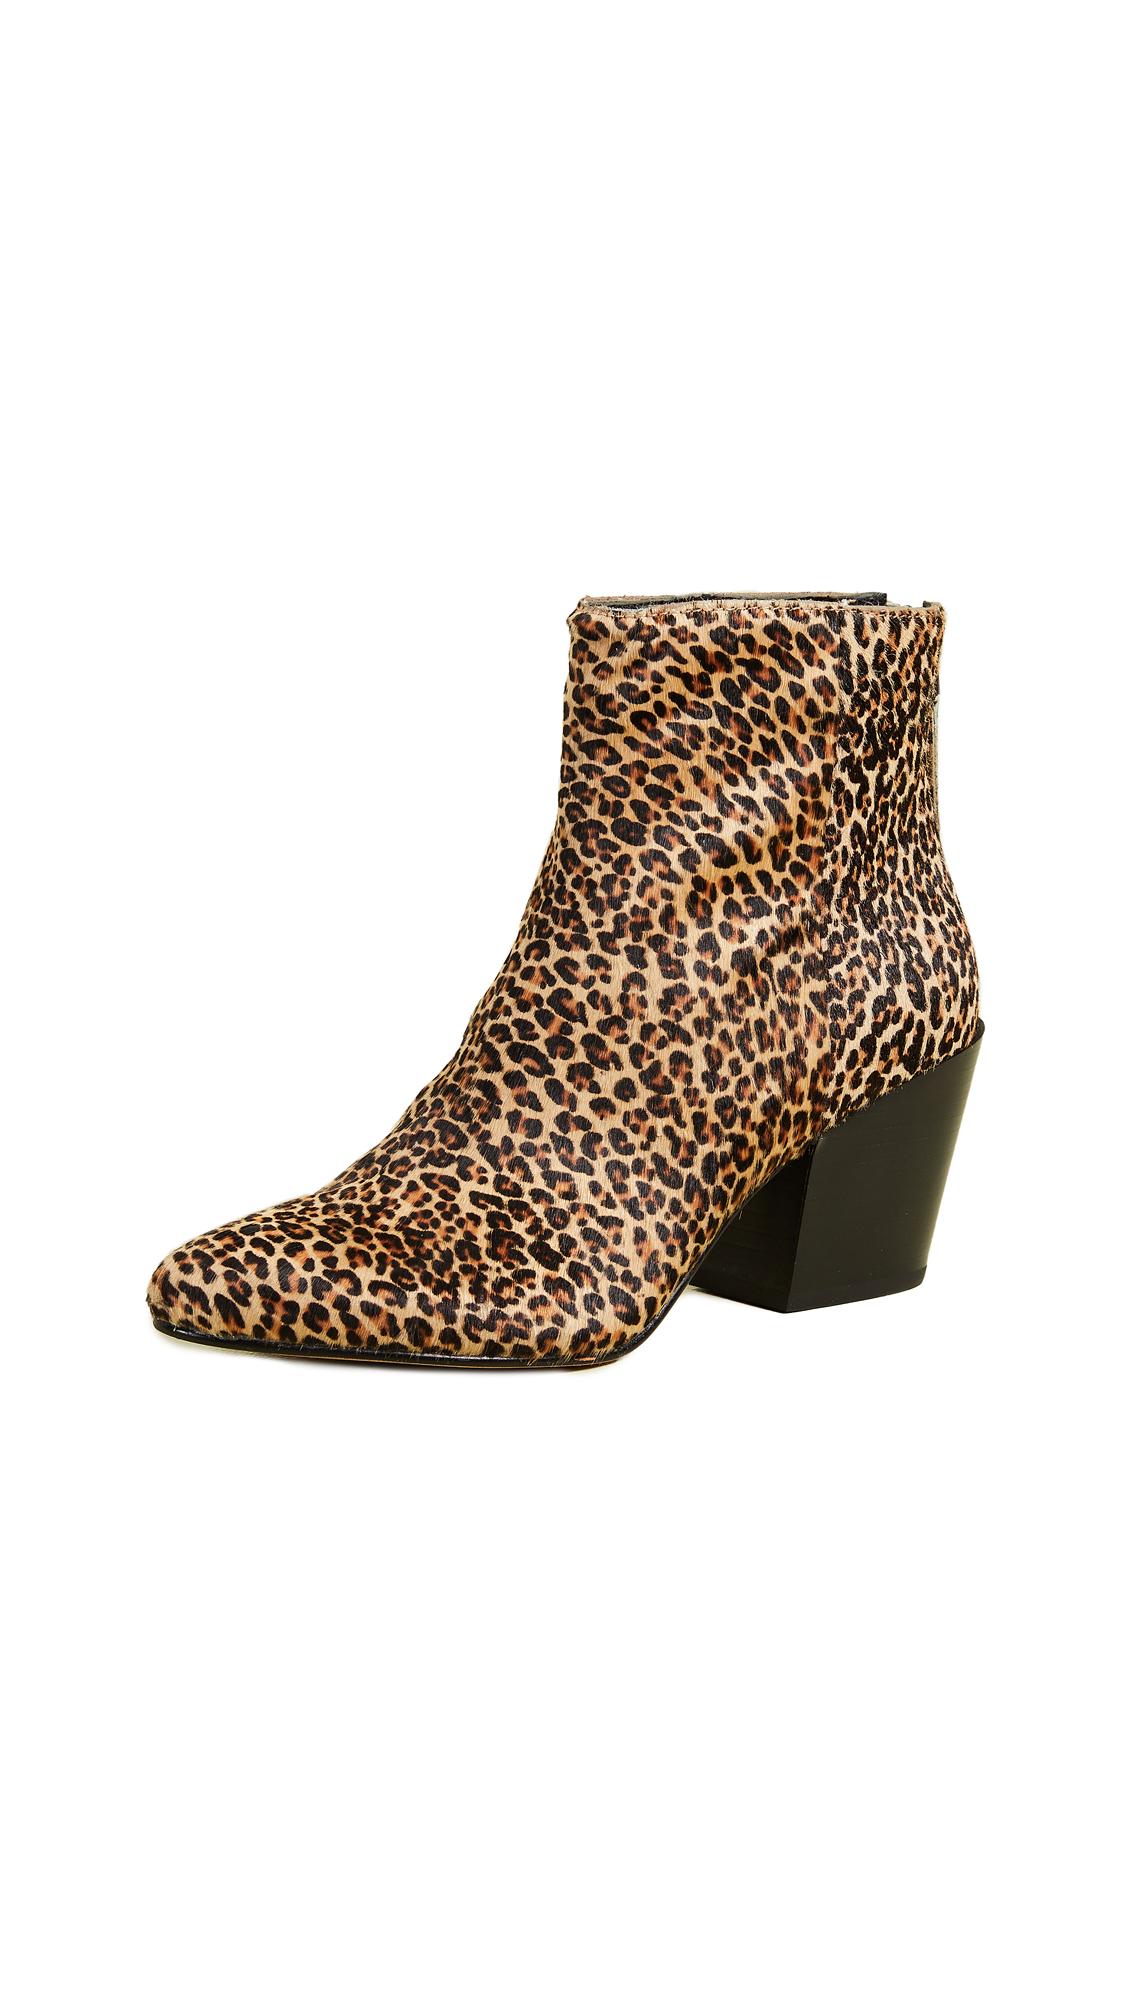 Dolce Vita Coltyn Block Heel Booties